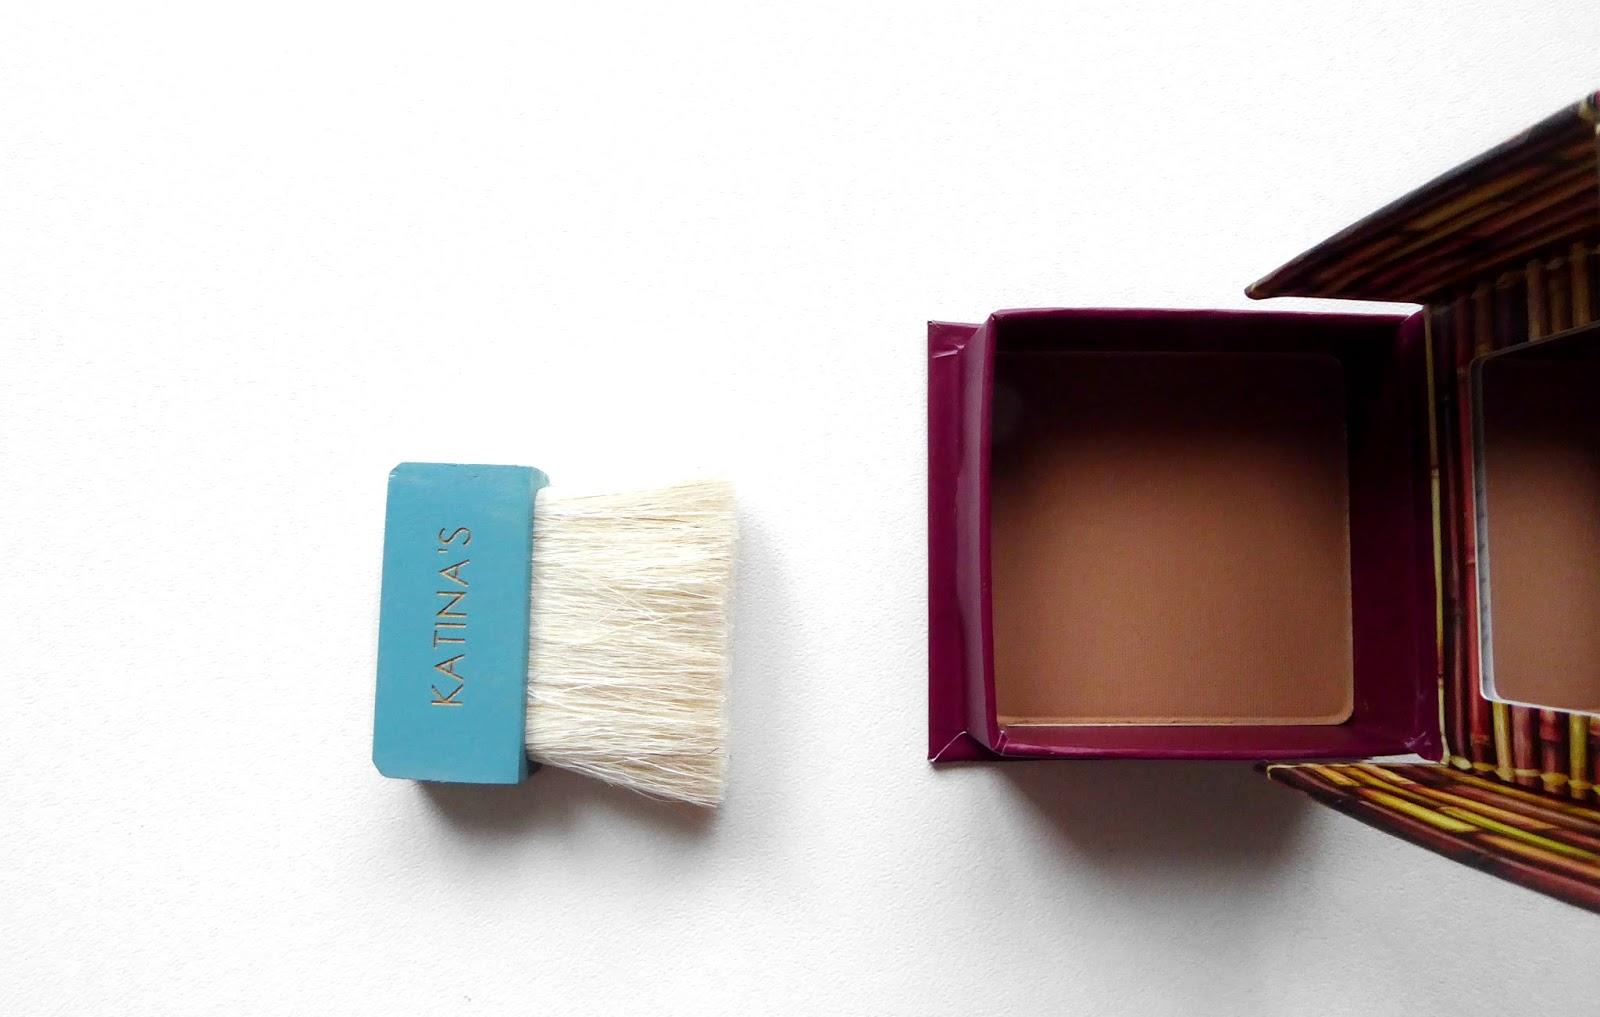 Benefit Cosmetics Hoola Vs. Dew The Hoola